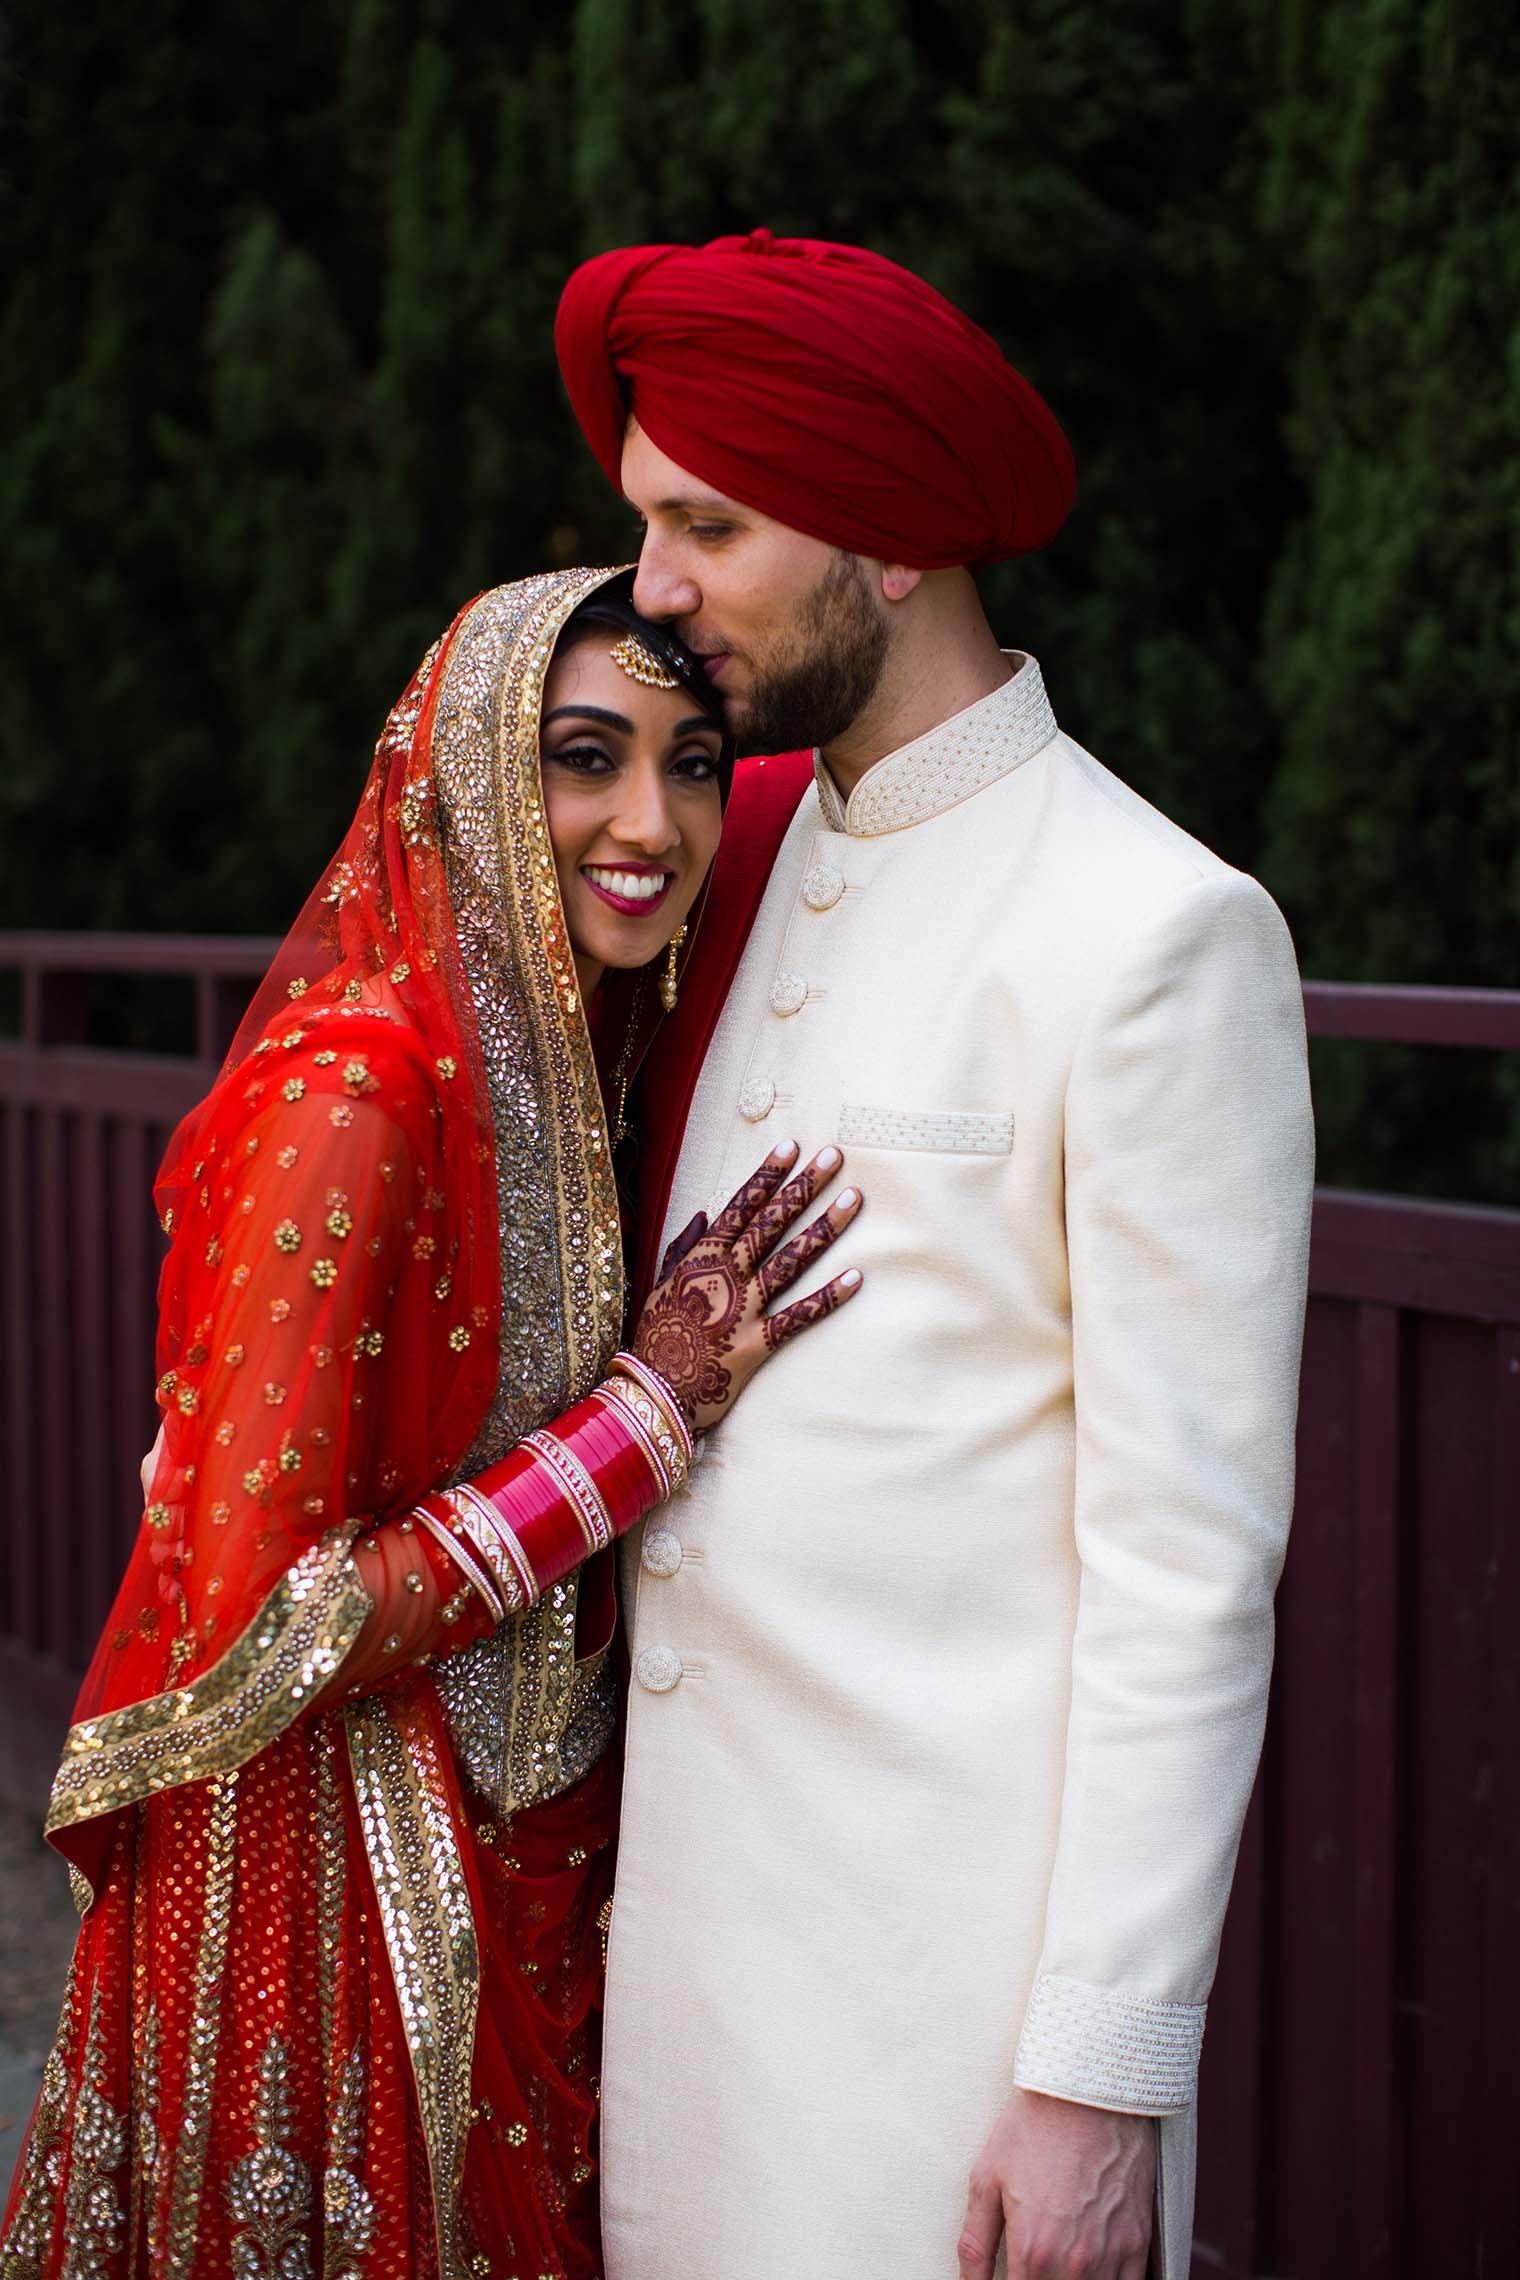 Gurdwara Sahib of Fremont Wedding Photography